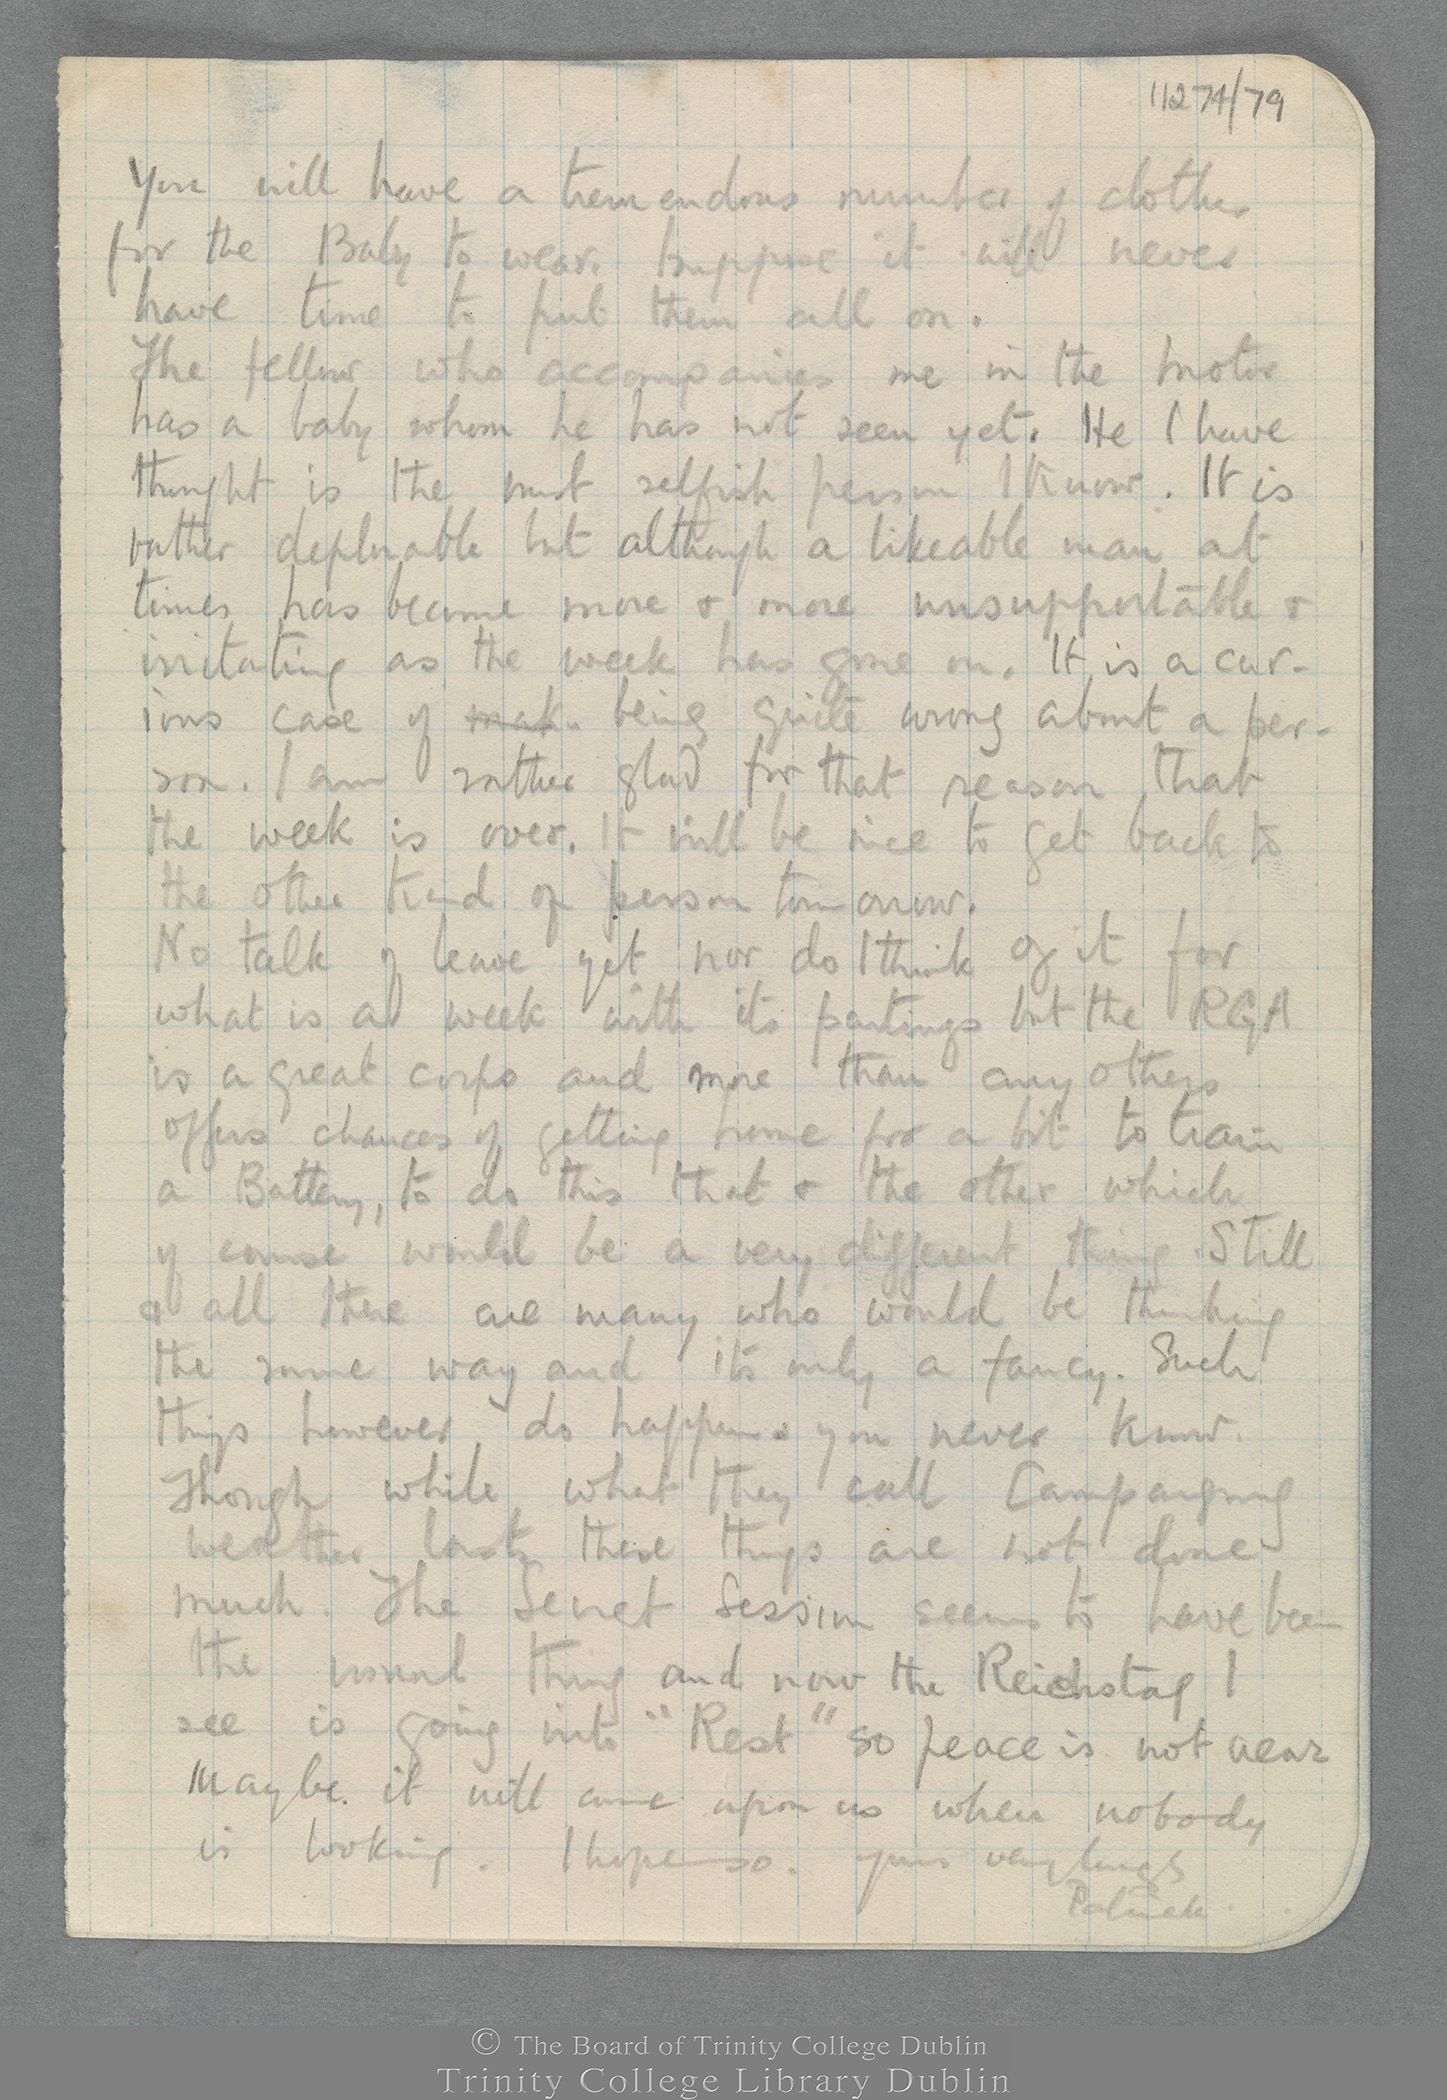 TCD MS 11274/79 folio 2 recto